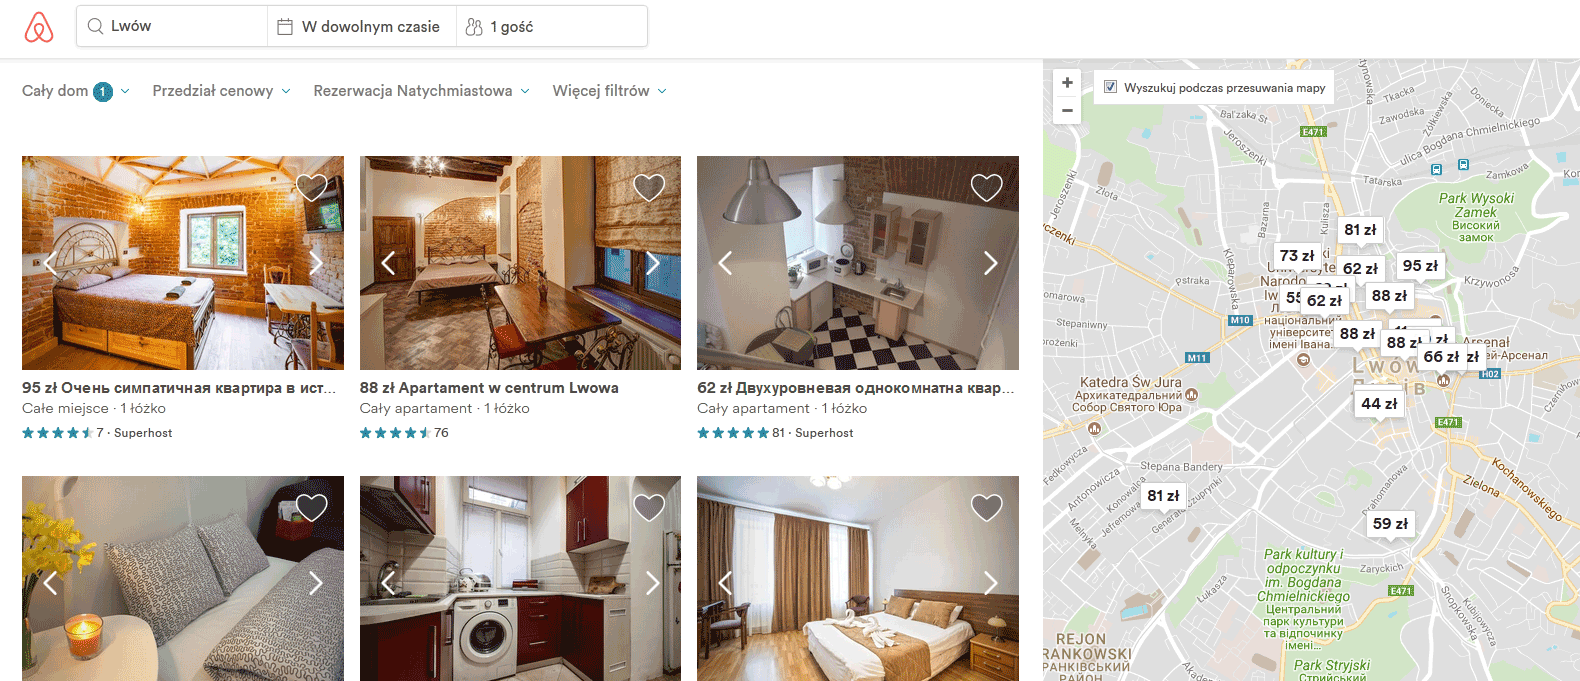 Wynajem na Airbnb - interfejs